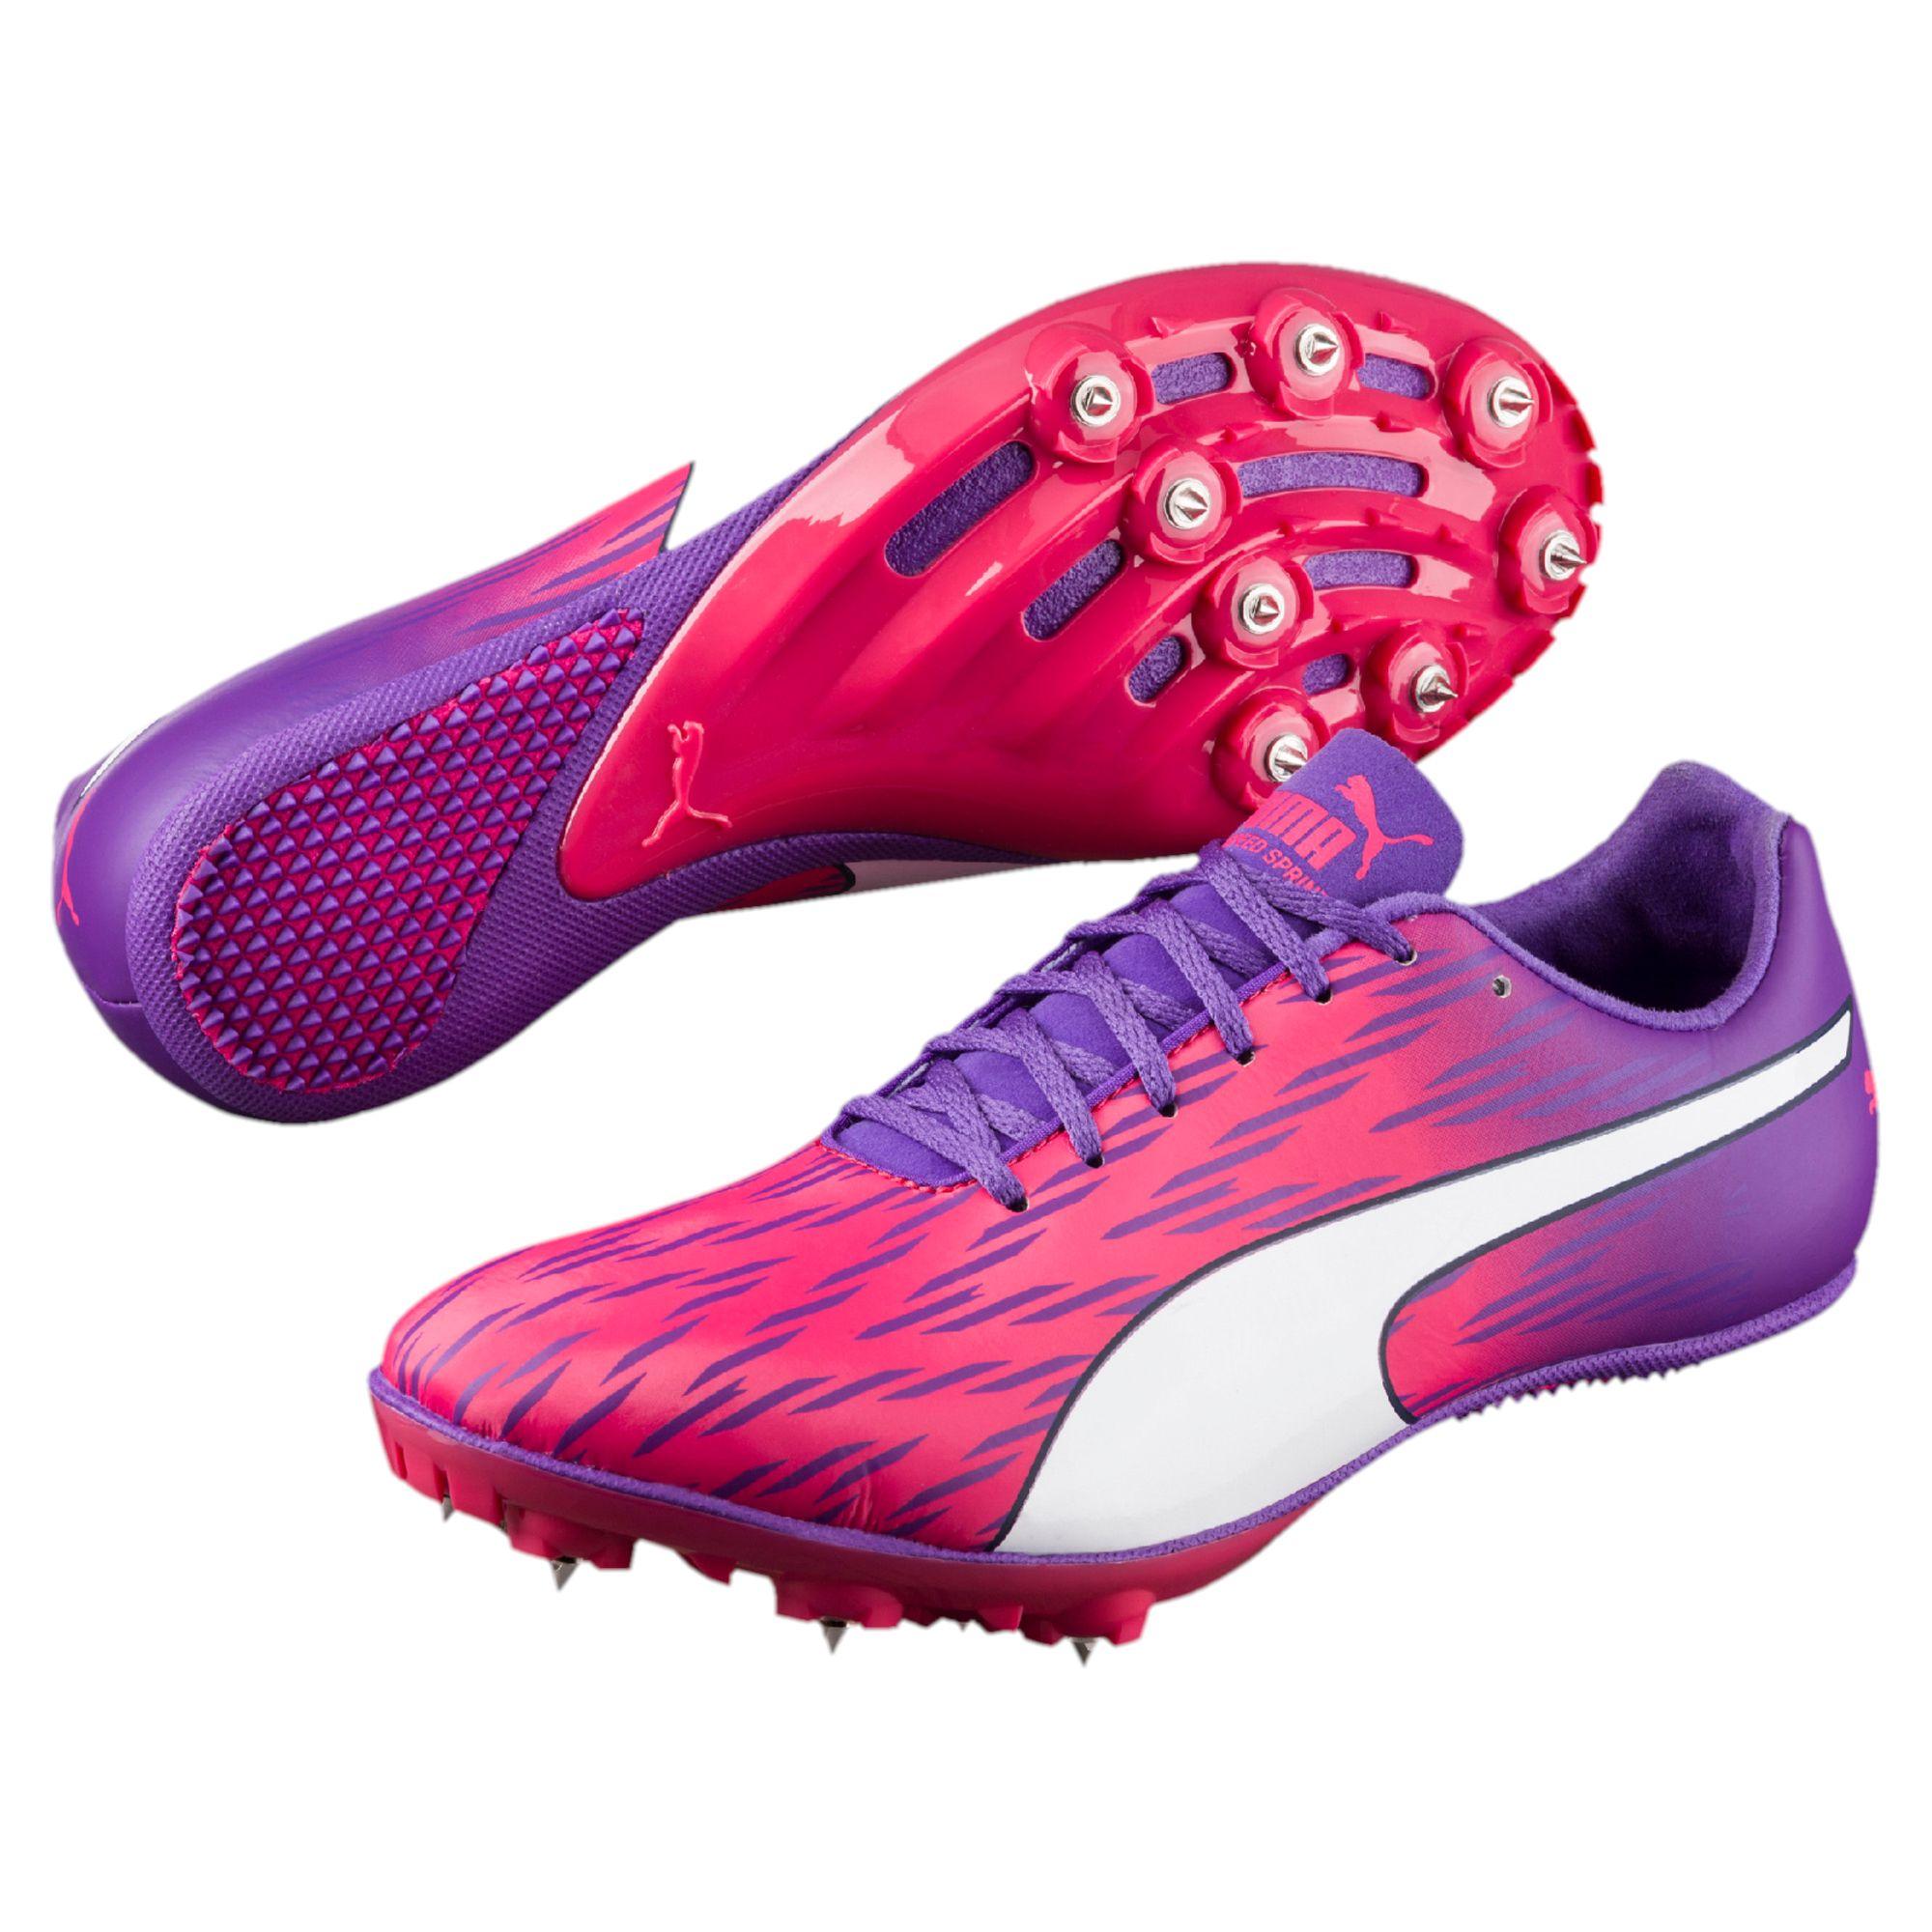 Femmes Sprint Evospeed 7 Wn Chaussures De Course Puma PhO1B